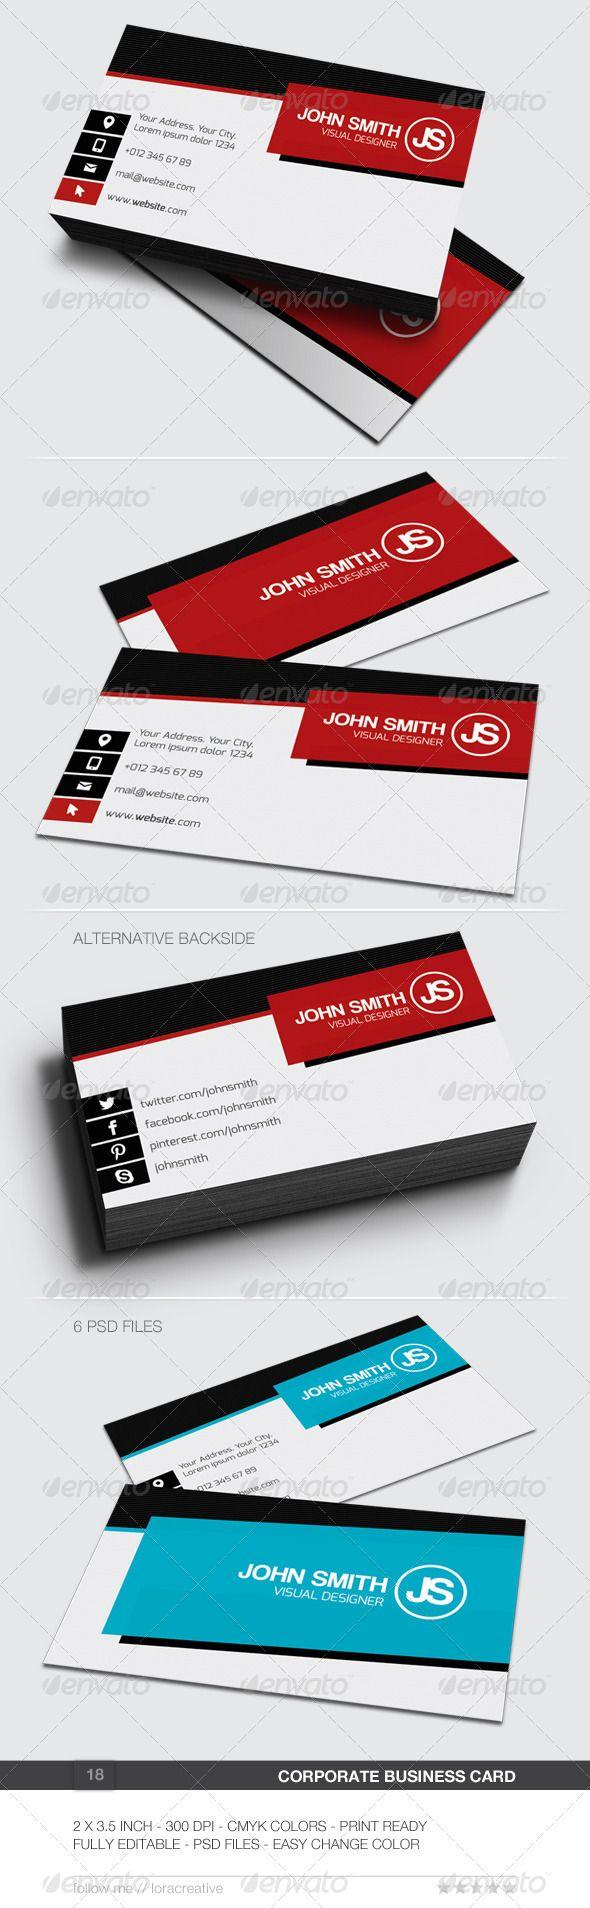 23 Best Business Card Design Images On Pinterest Business Card